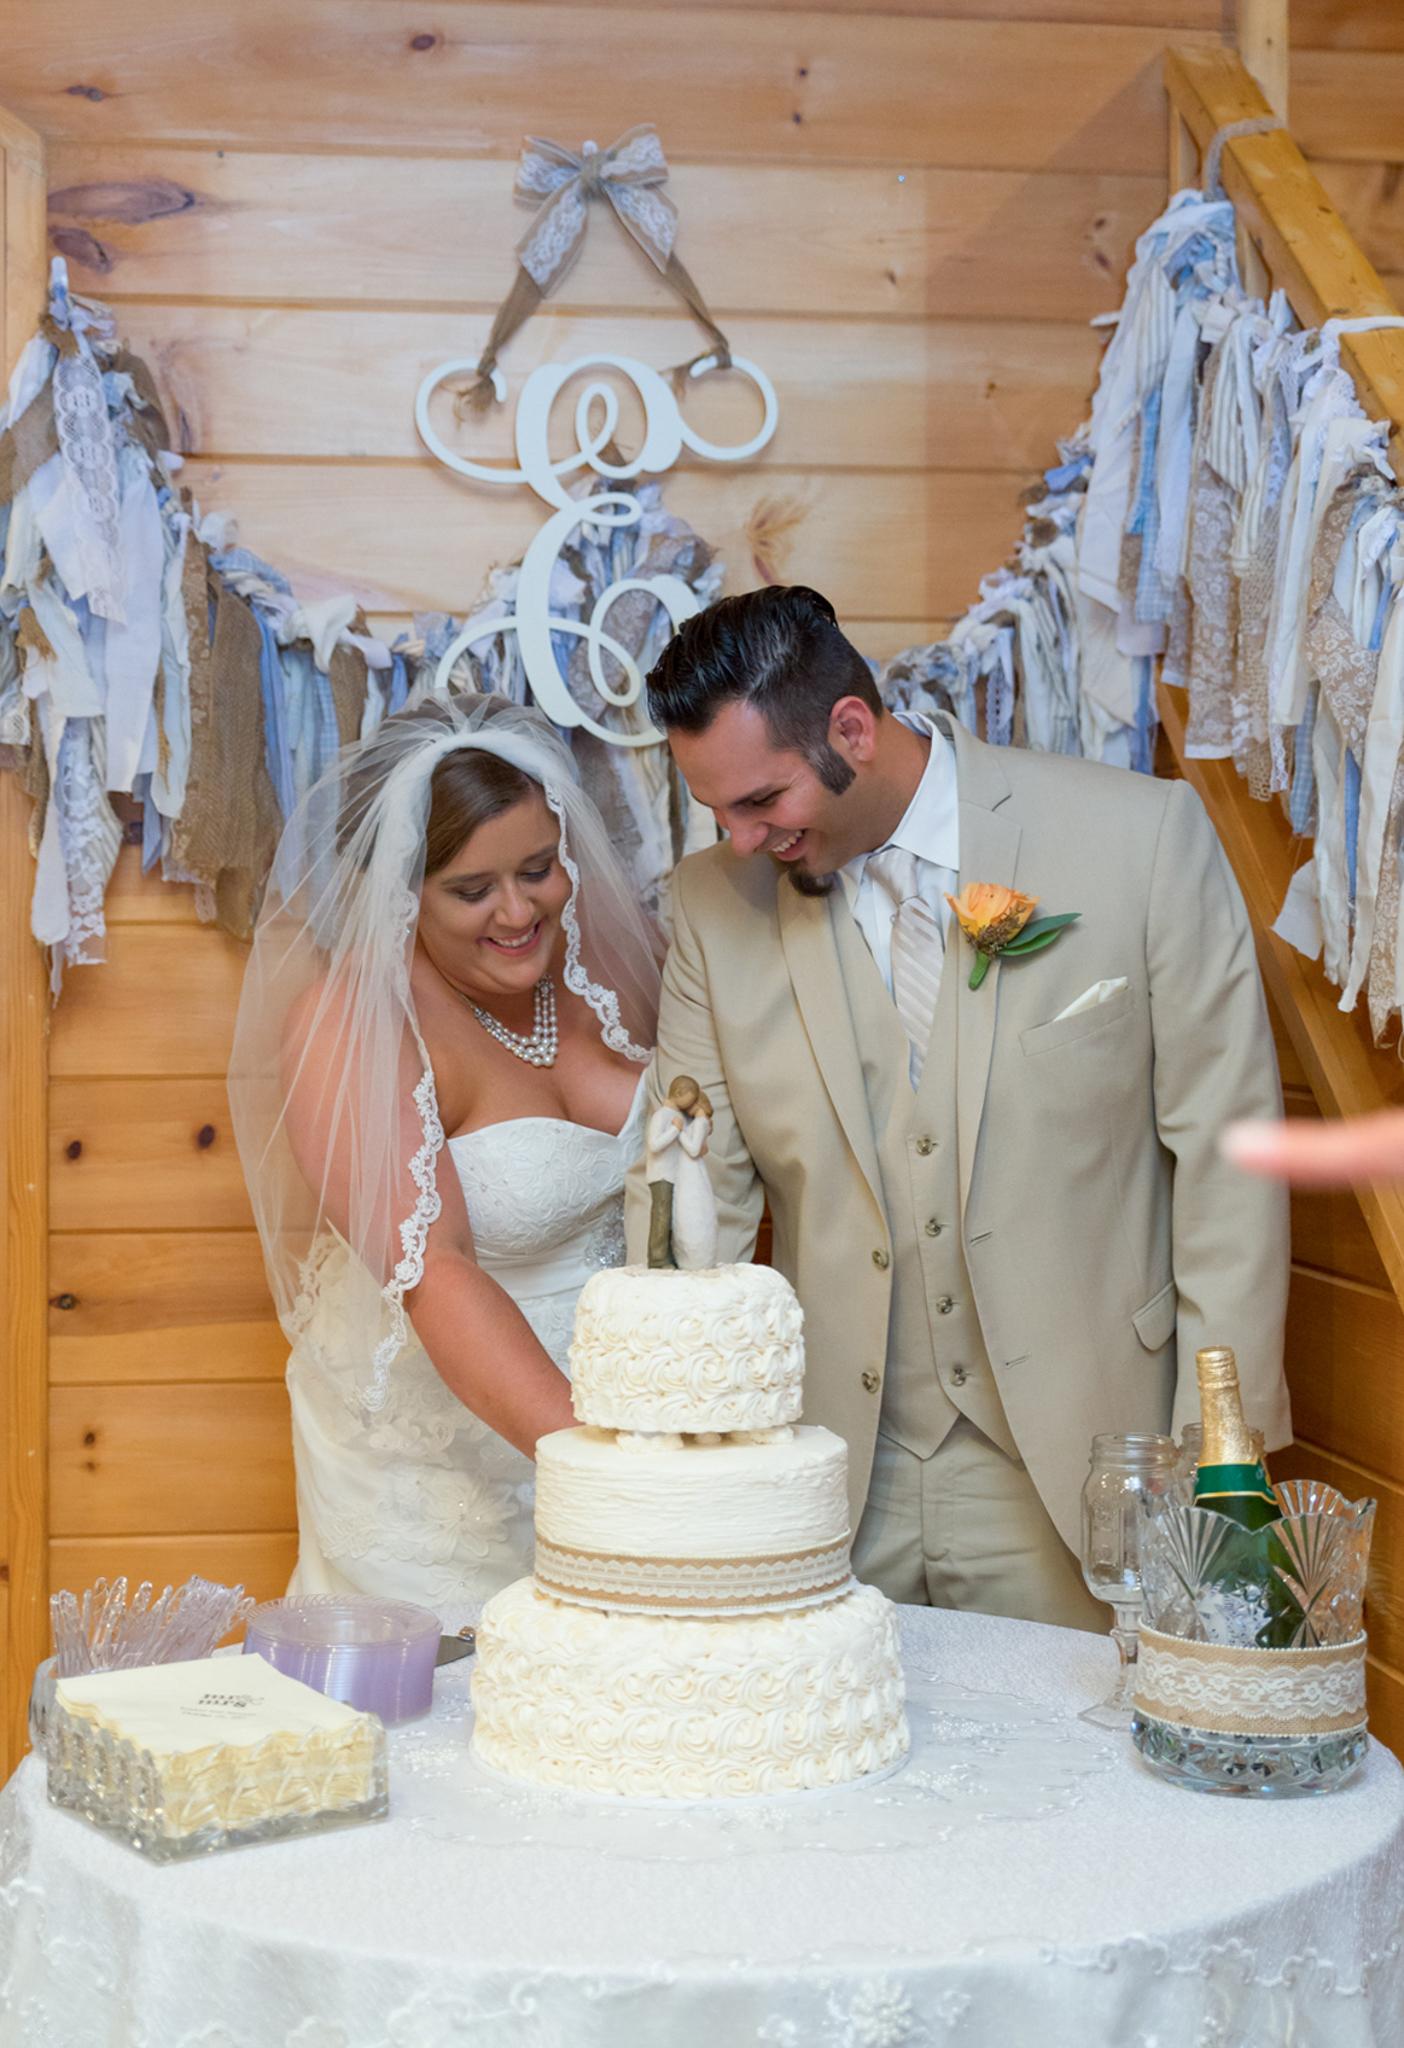 Bride and Groom cutting cake at Gatlinburg wedding